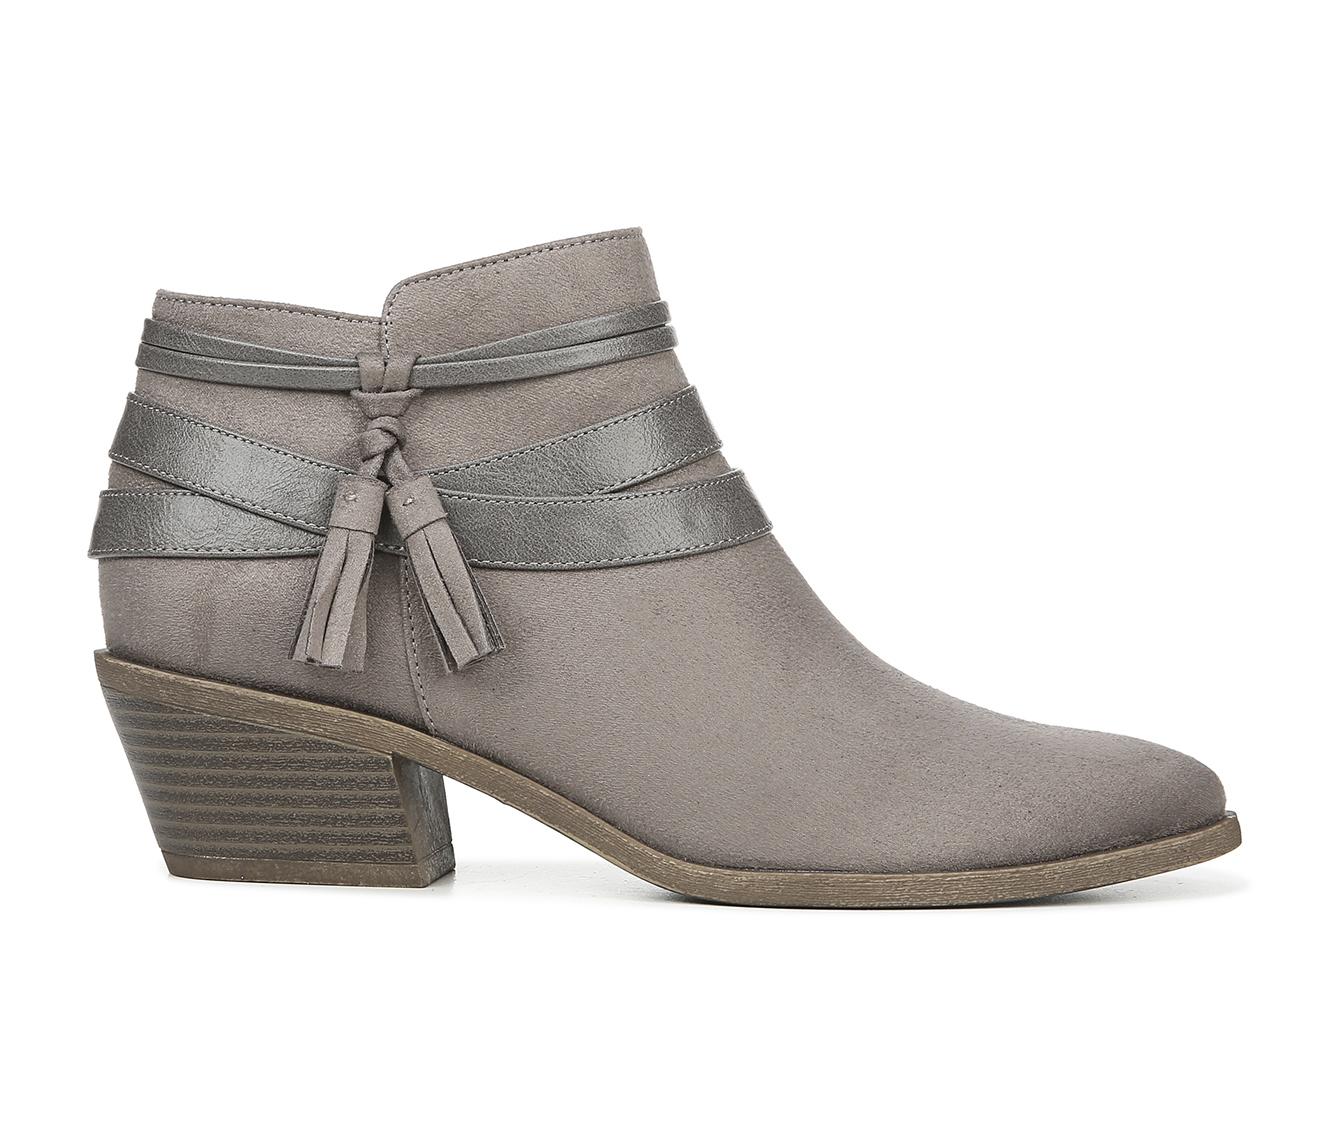 LifeStride Paloma Women's Boots (Gray - Canvas)